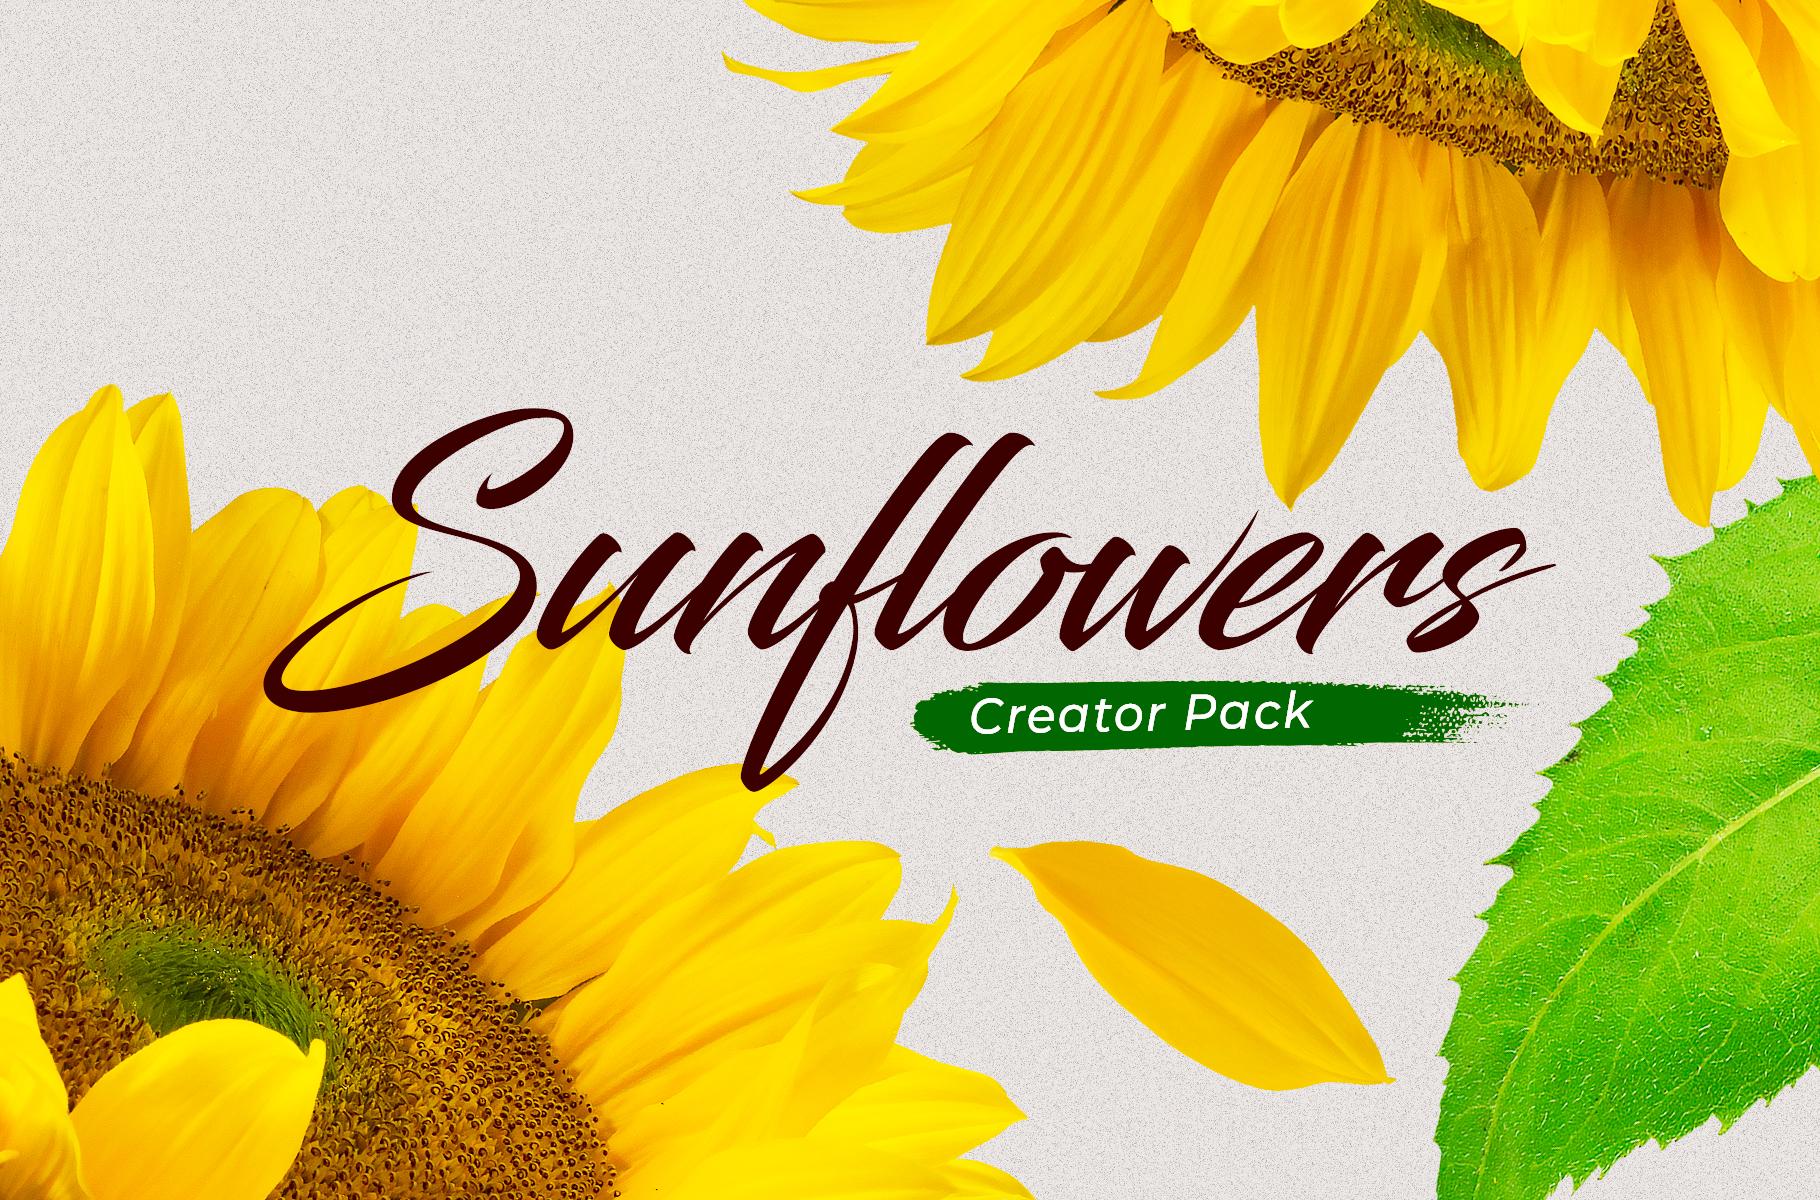 https://s3u.tmimgcdn.com/1420880-1583601006750_Cover-Sunflowers.jpg